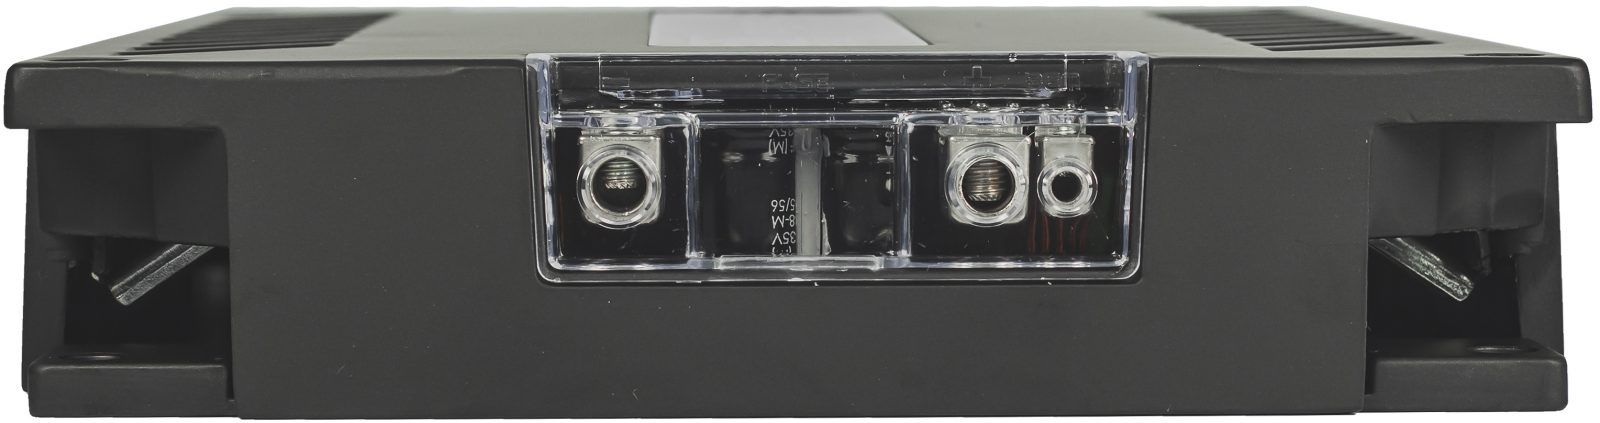 Módulo Amplificador Banda ICE X 3002 1 Canal 2 Ohms